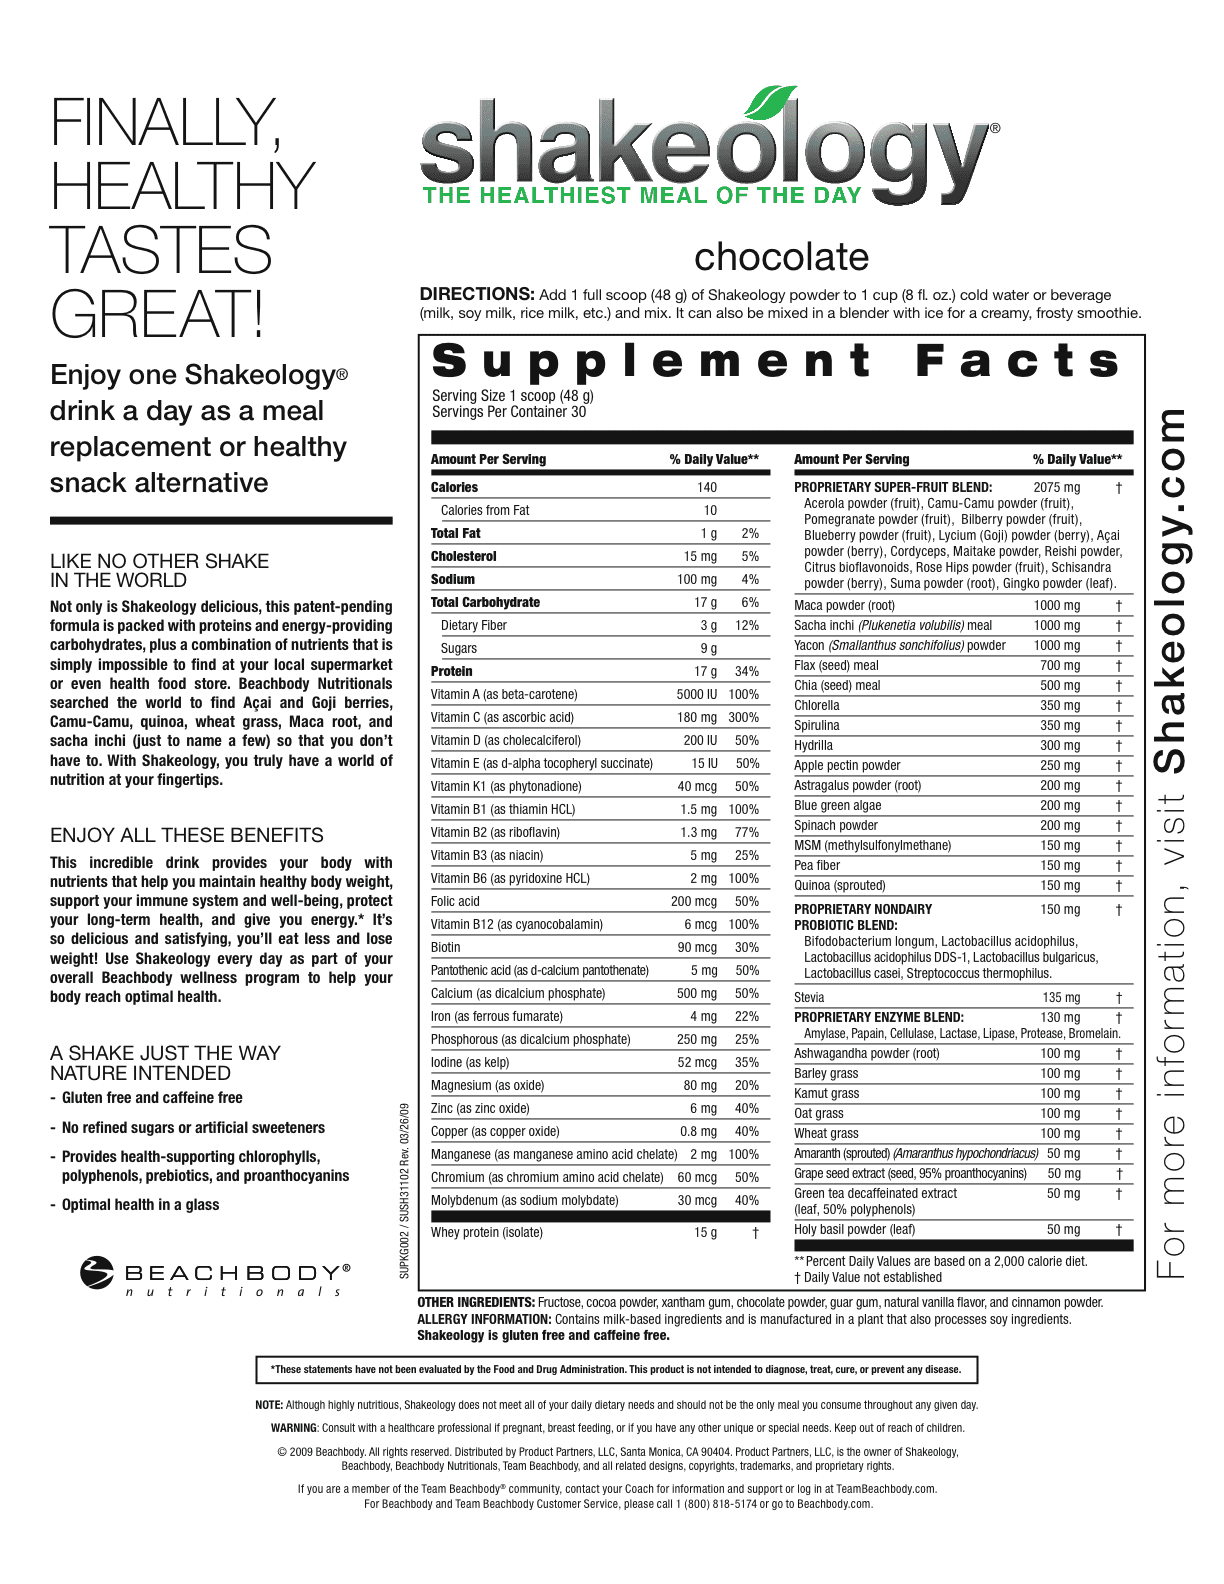 All Shakeology Ingredients